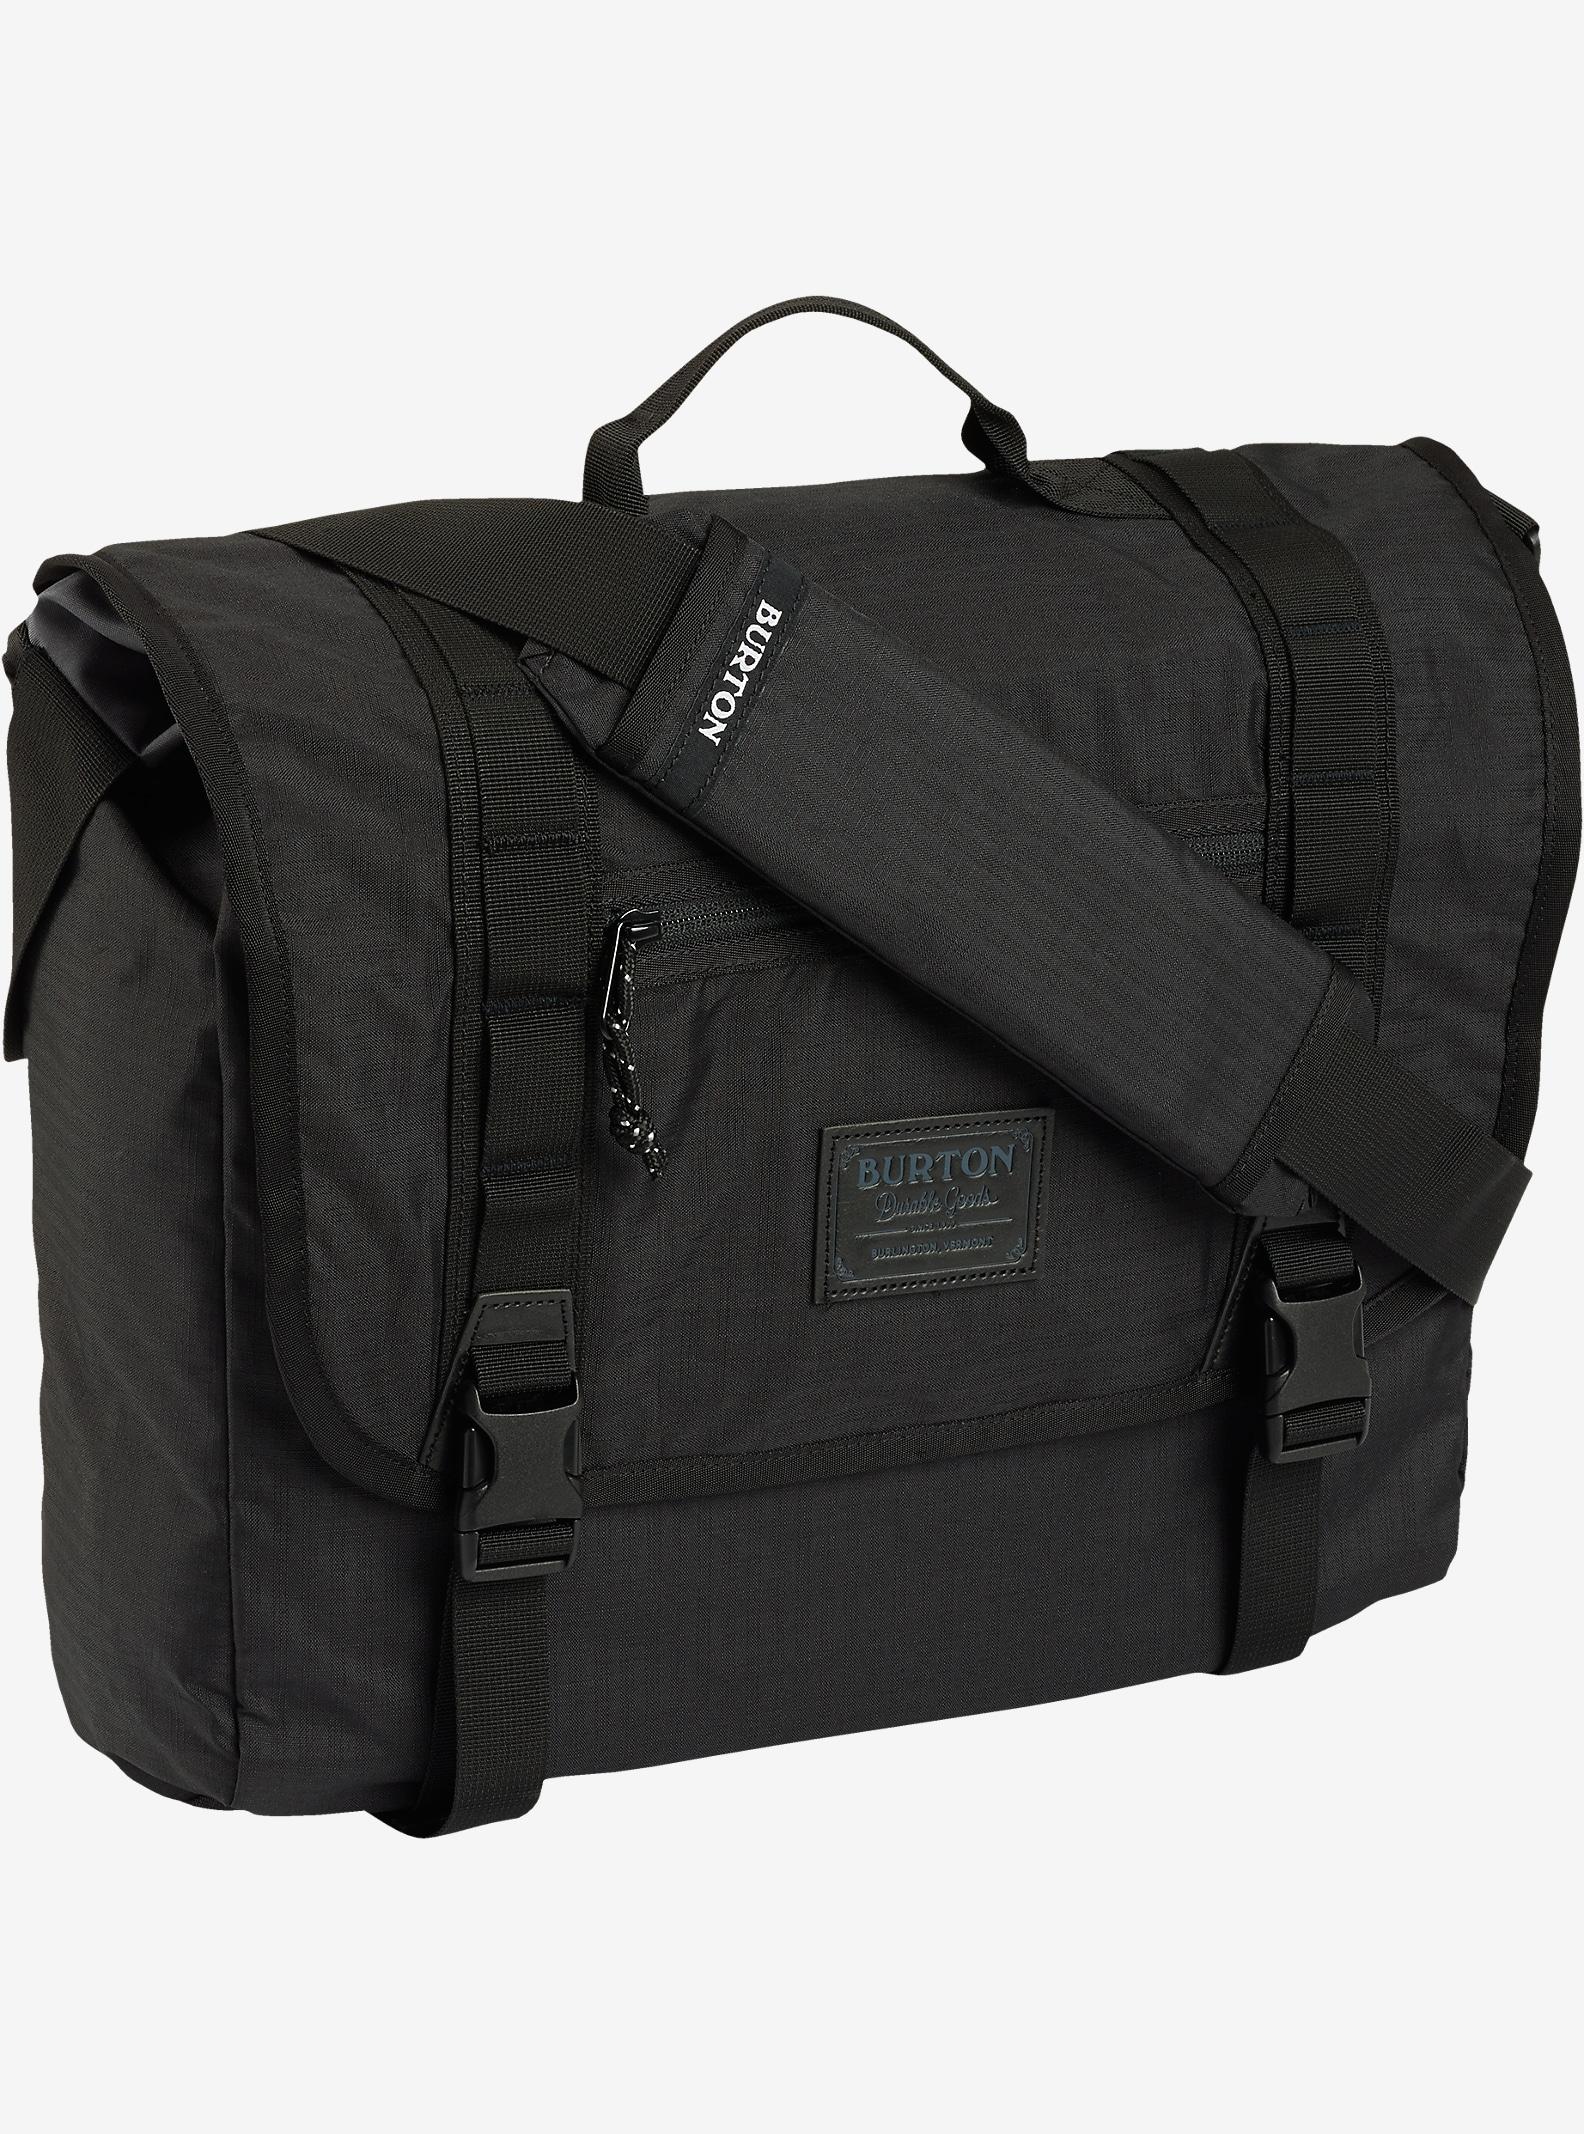 Burton Flint Messenger Bag shown in True Black Triple Ripstop